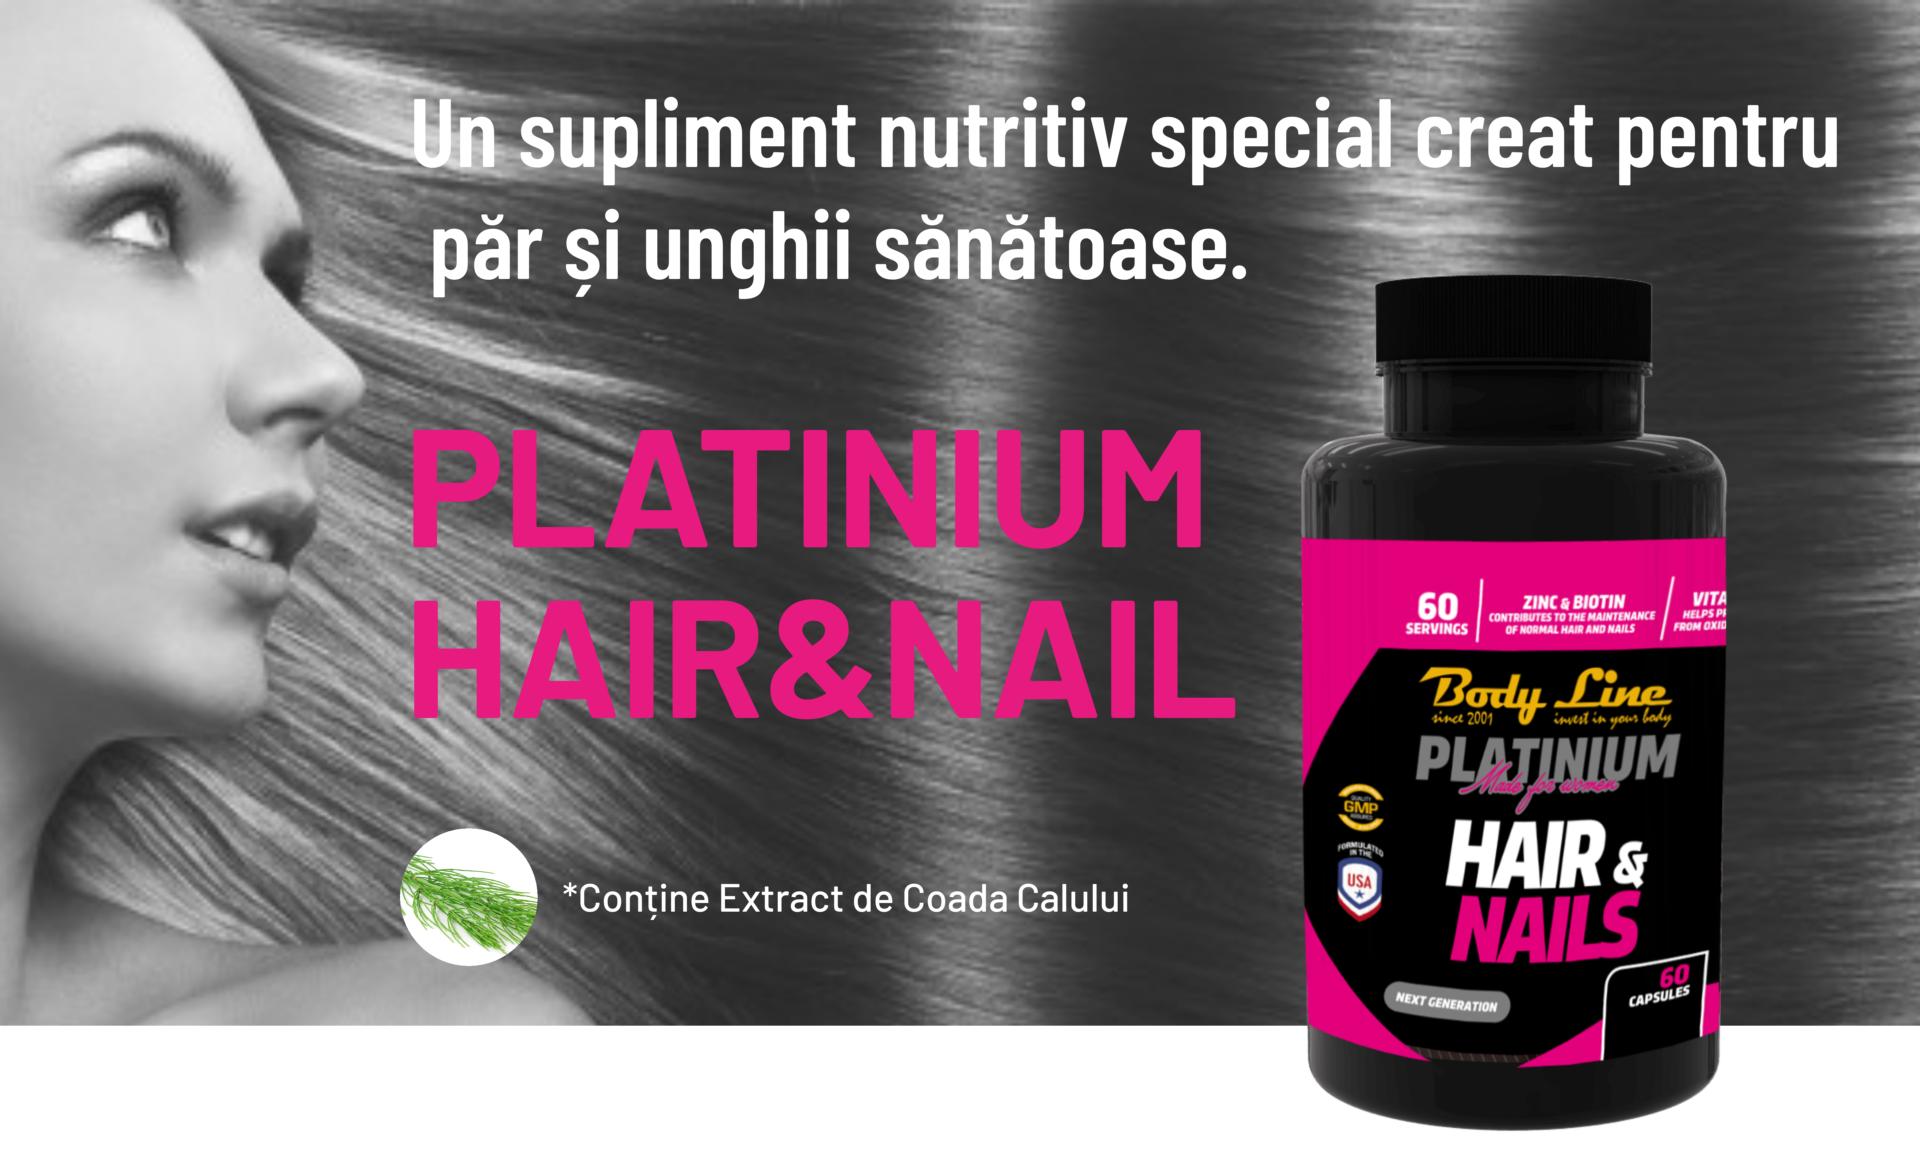 PLATINIUM HAIR&NAIL NEW PRODUCT BODY LINE - Tratament pentru păr și unghii